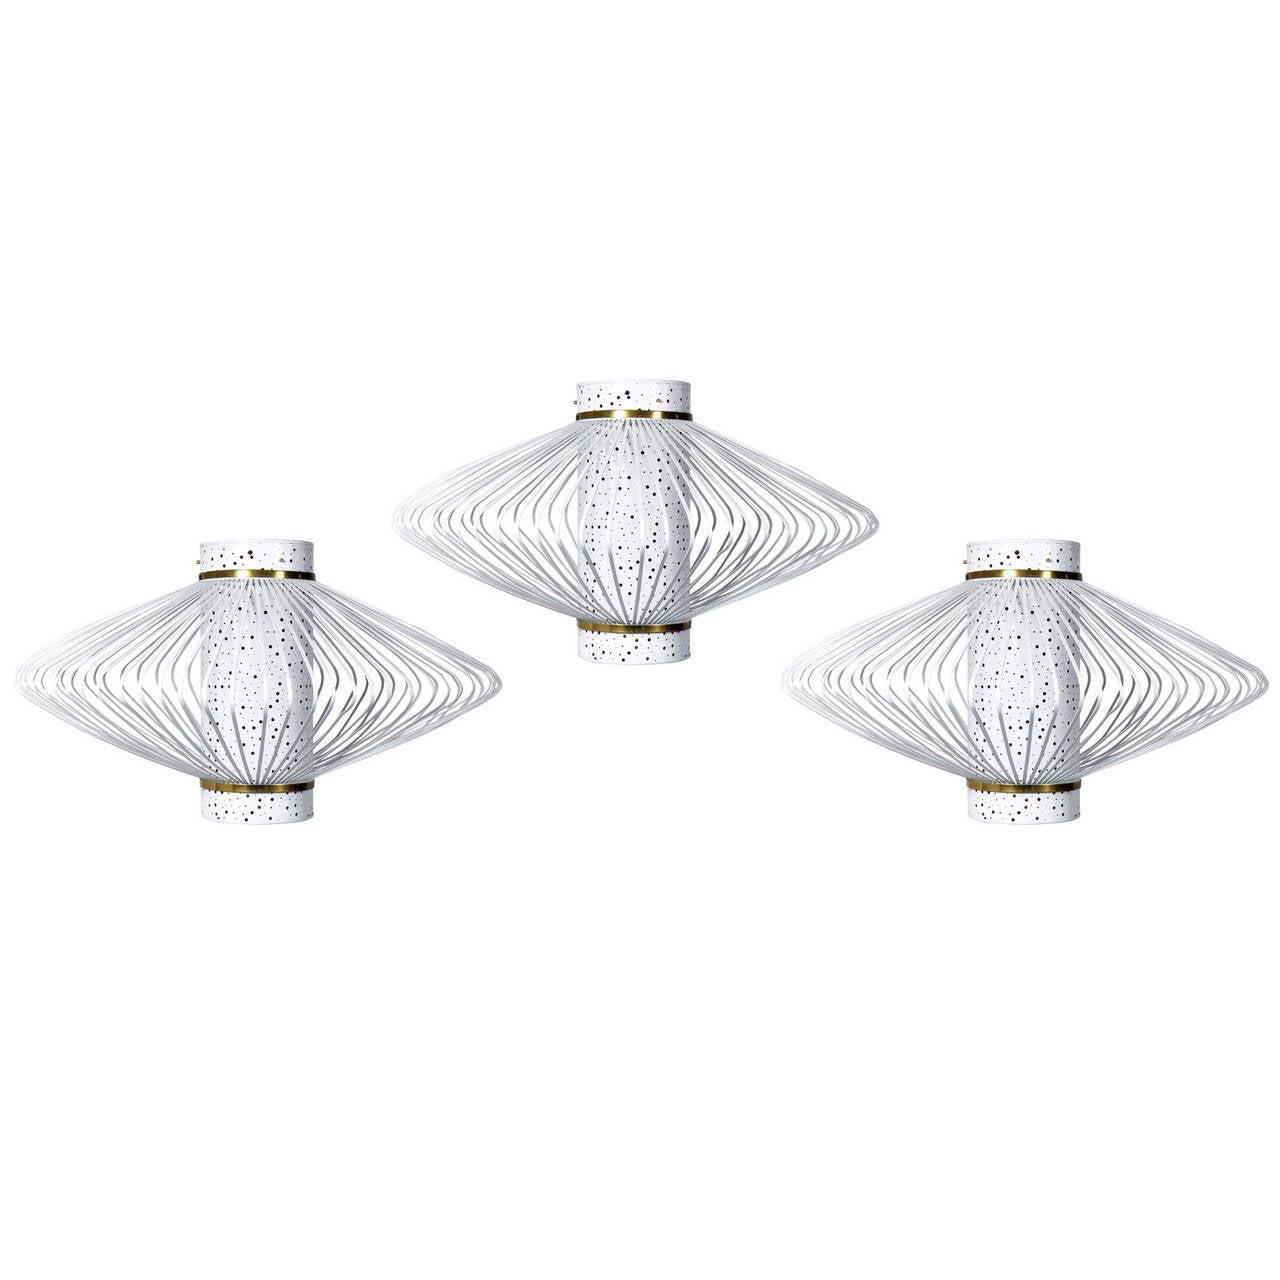 Three Modernist Chandeliers or Light Fixtures